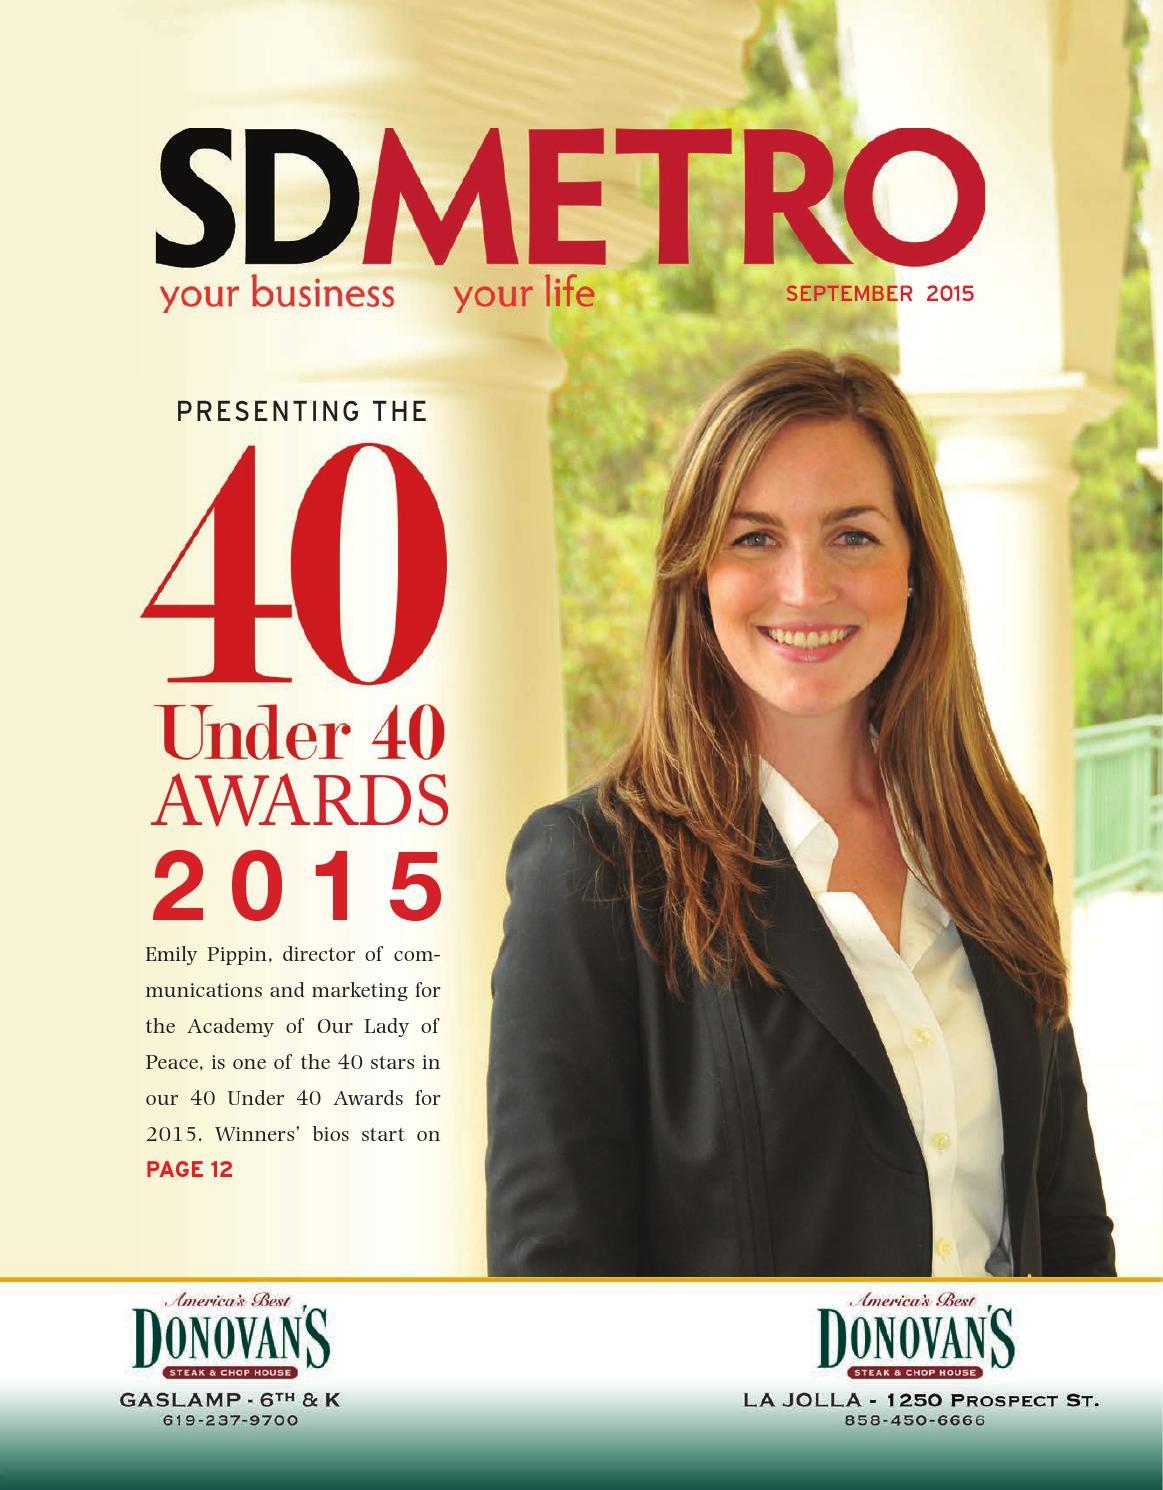 SD METRO SEPTEMBER 2015 by SD METRO - issuu